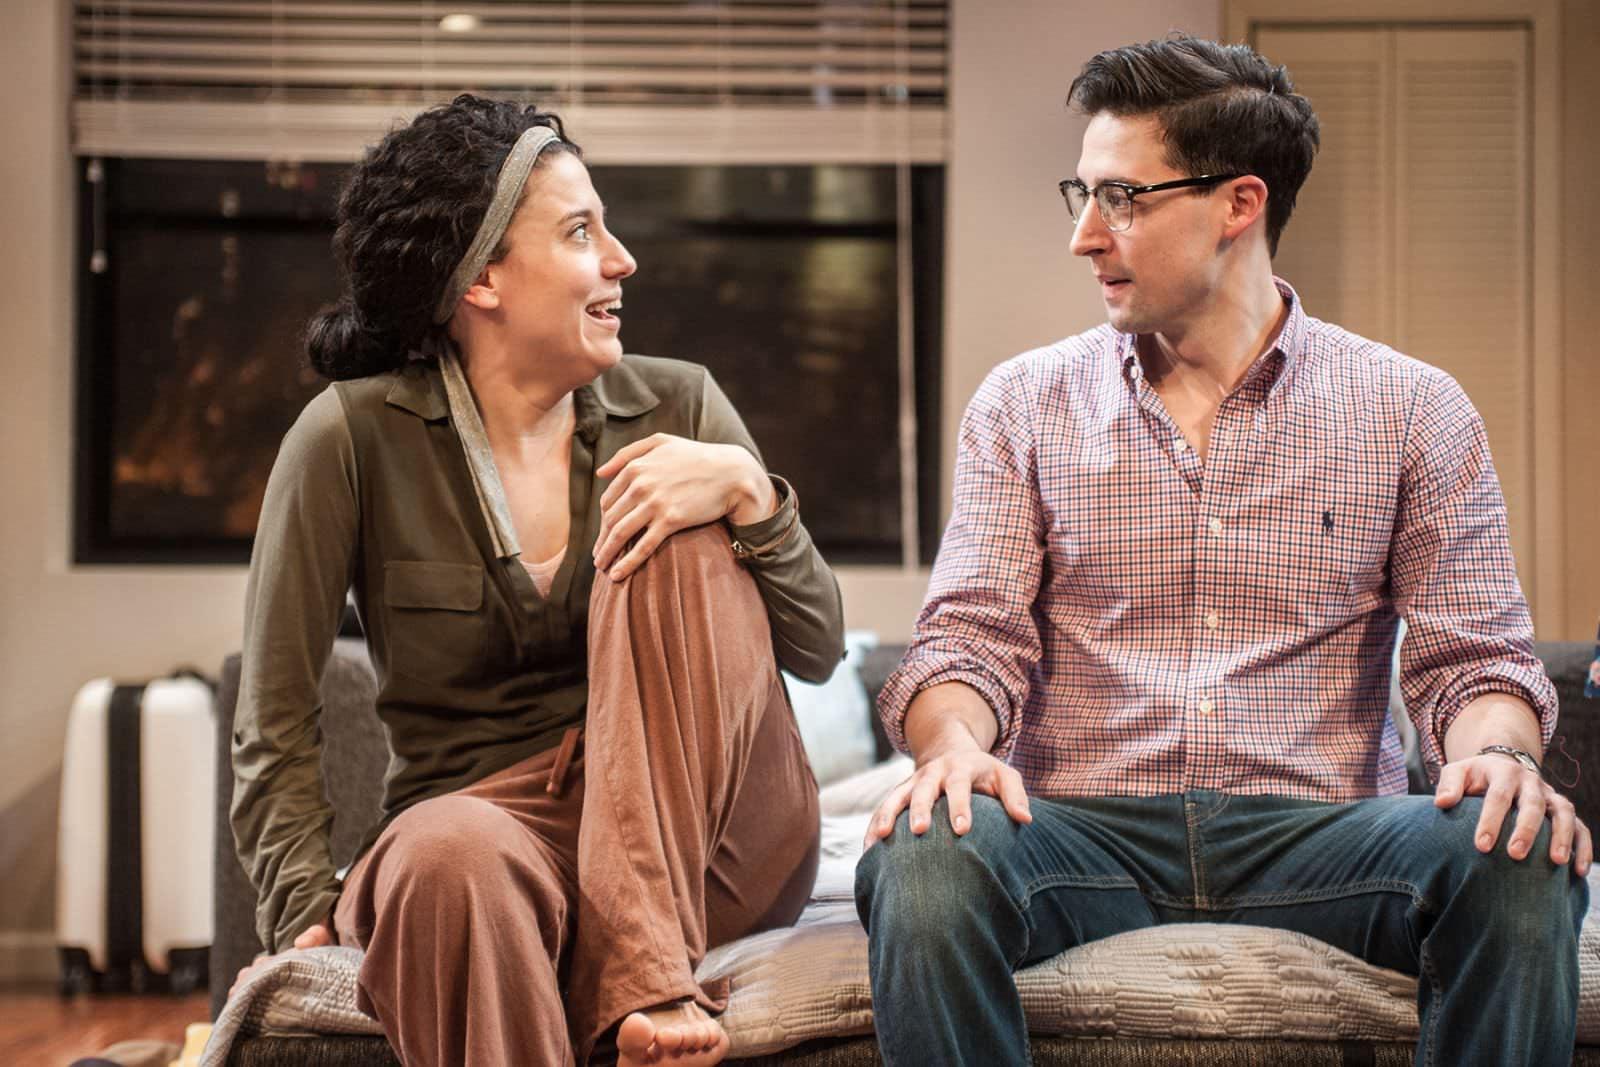 Irene Sofia Lucio (Daphna), and Alex Mandell (Liam). Photo by Teddy Wolff.